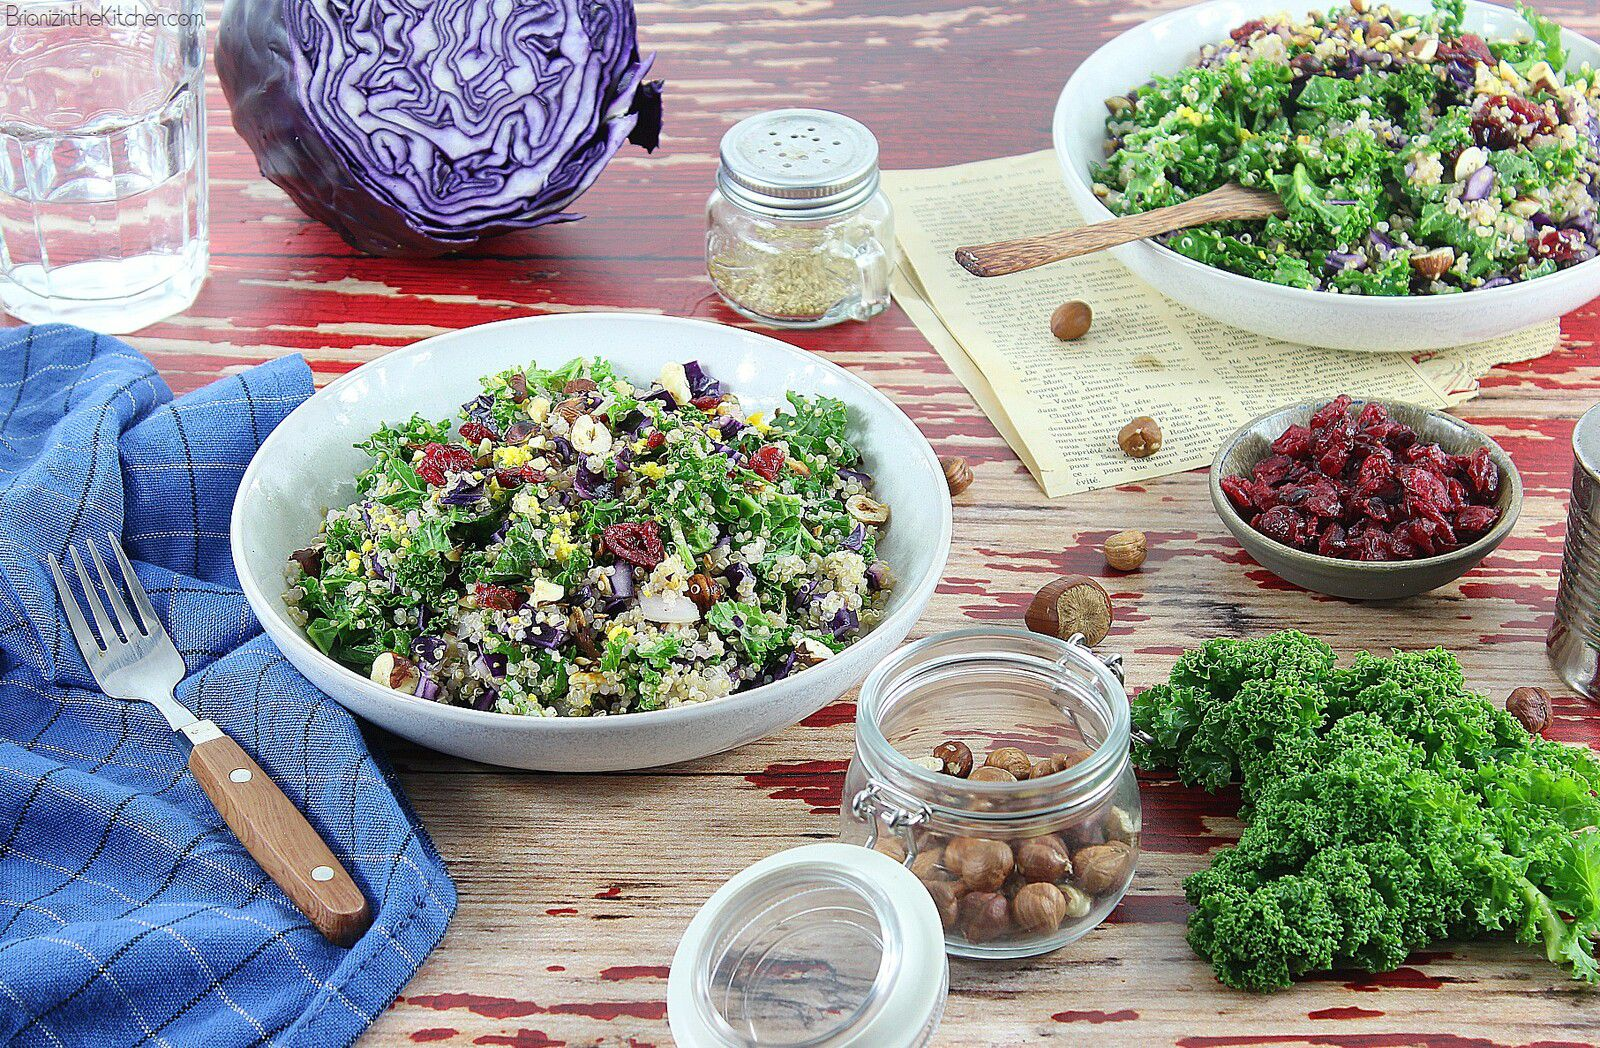 Salade d'Hiver au Quinoa et Super-Aliments